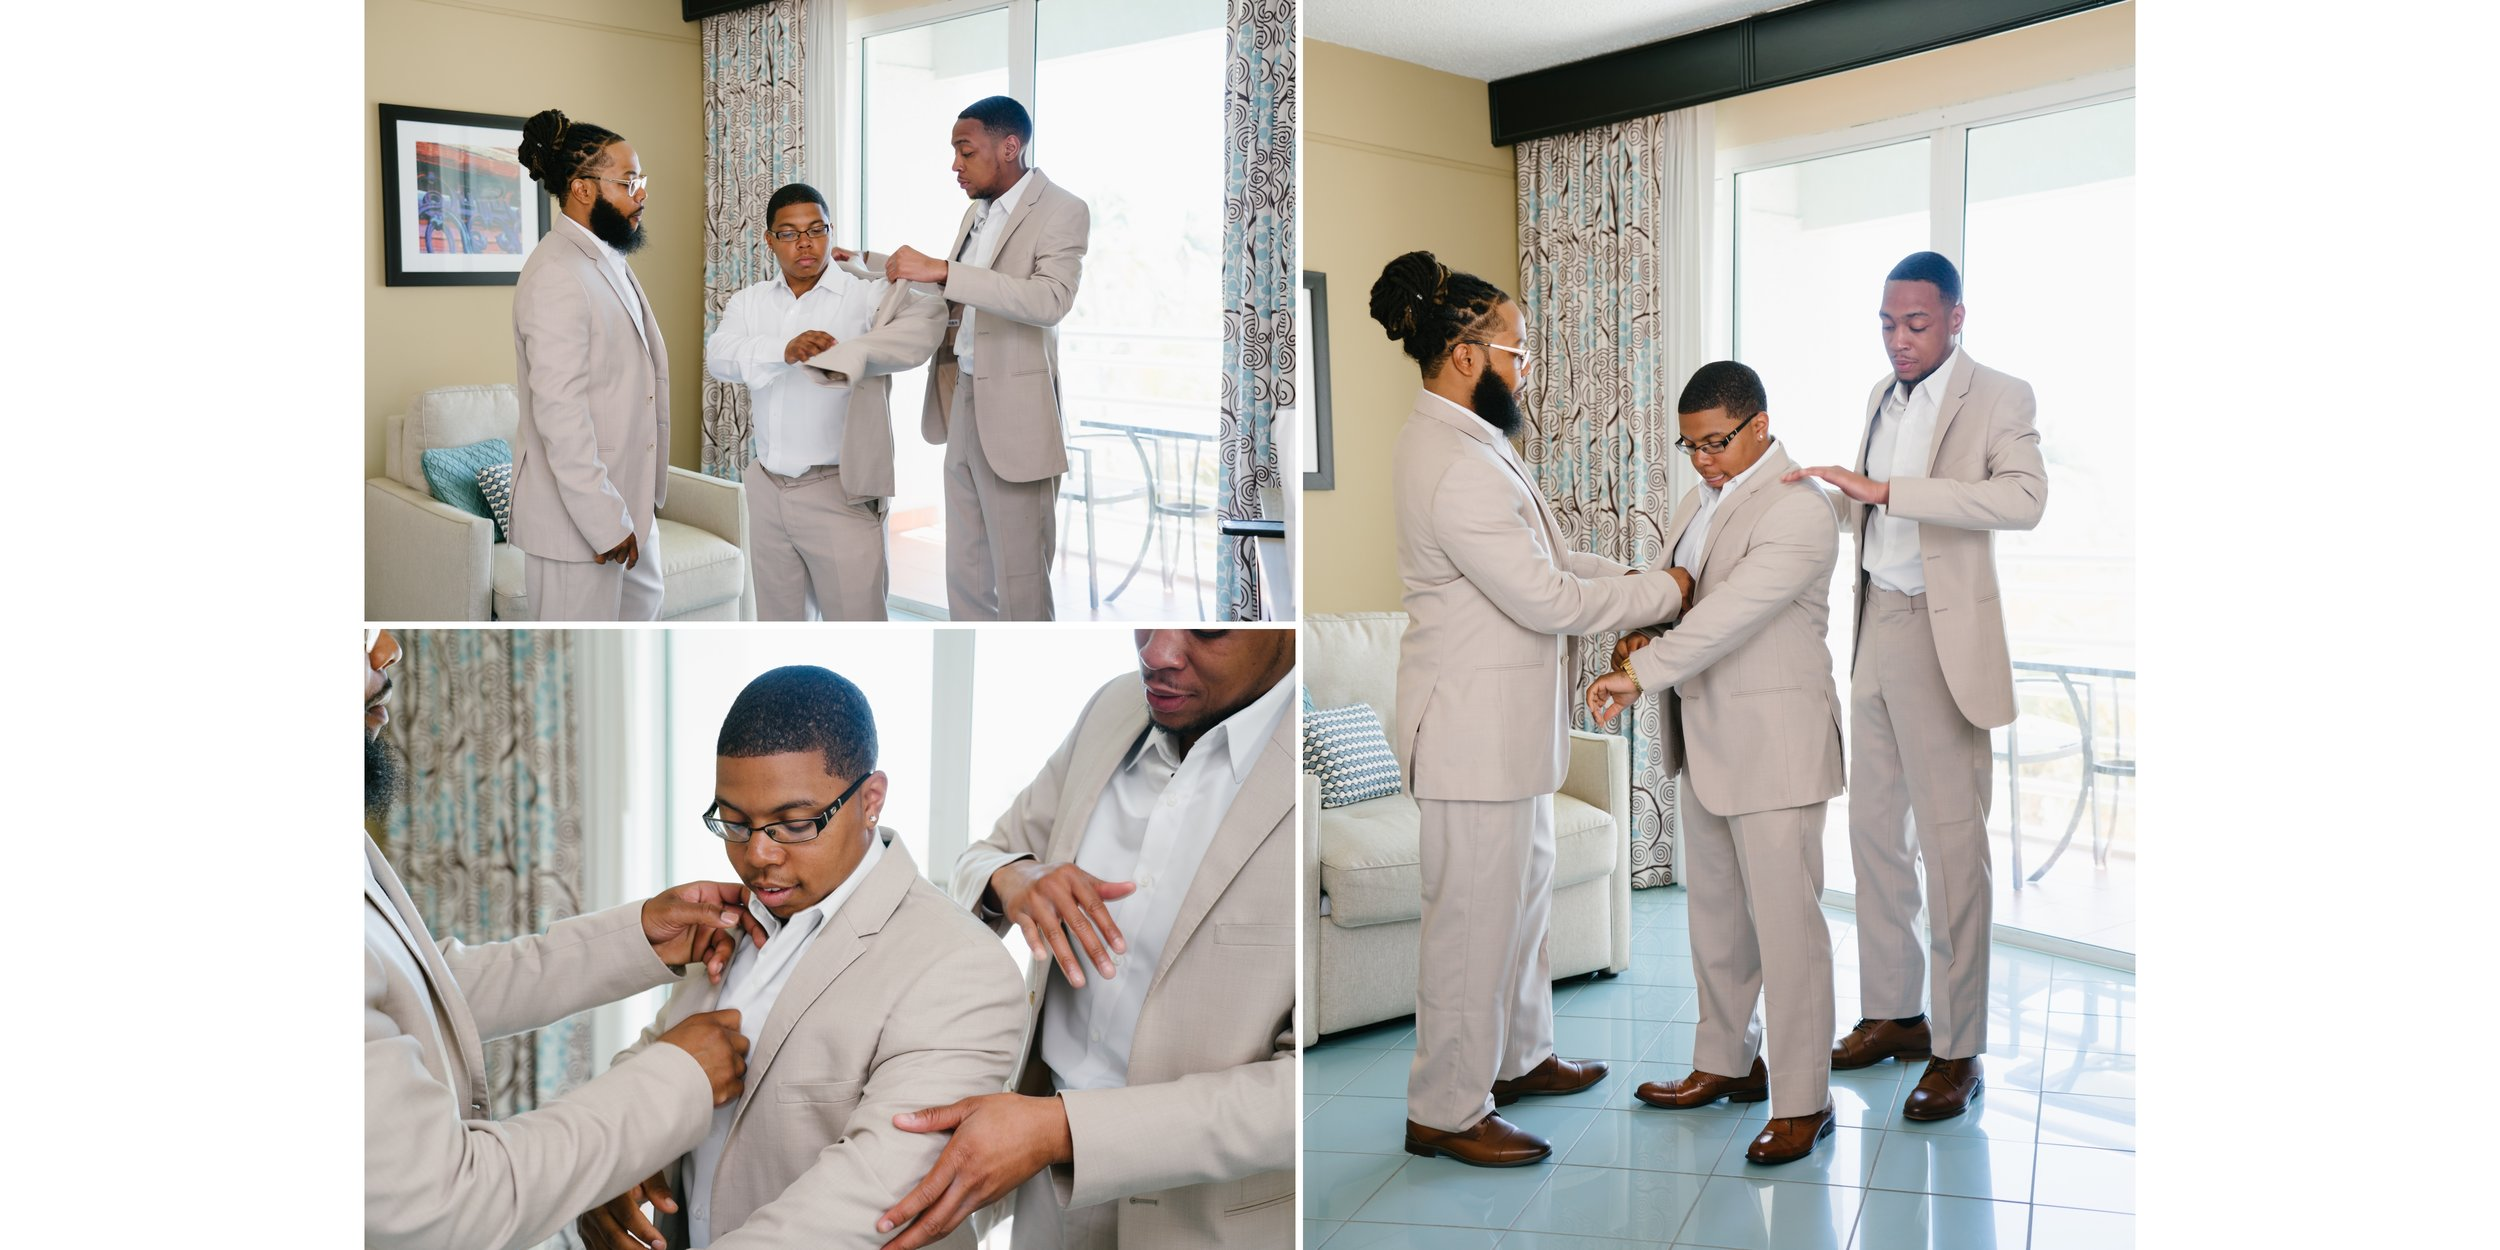 destination wedding in the Caribbean